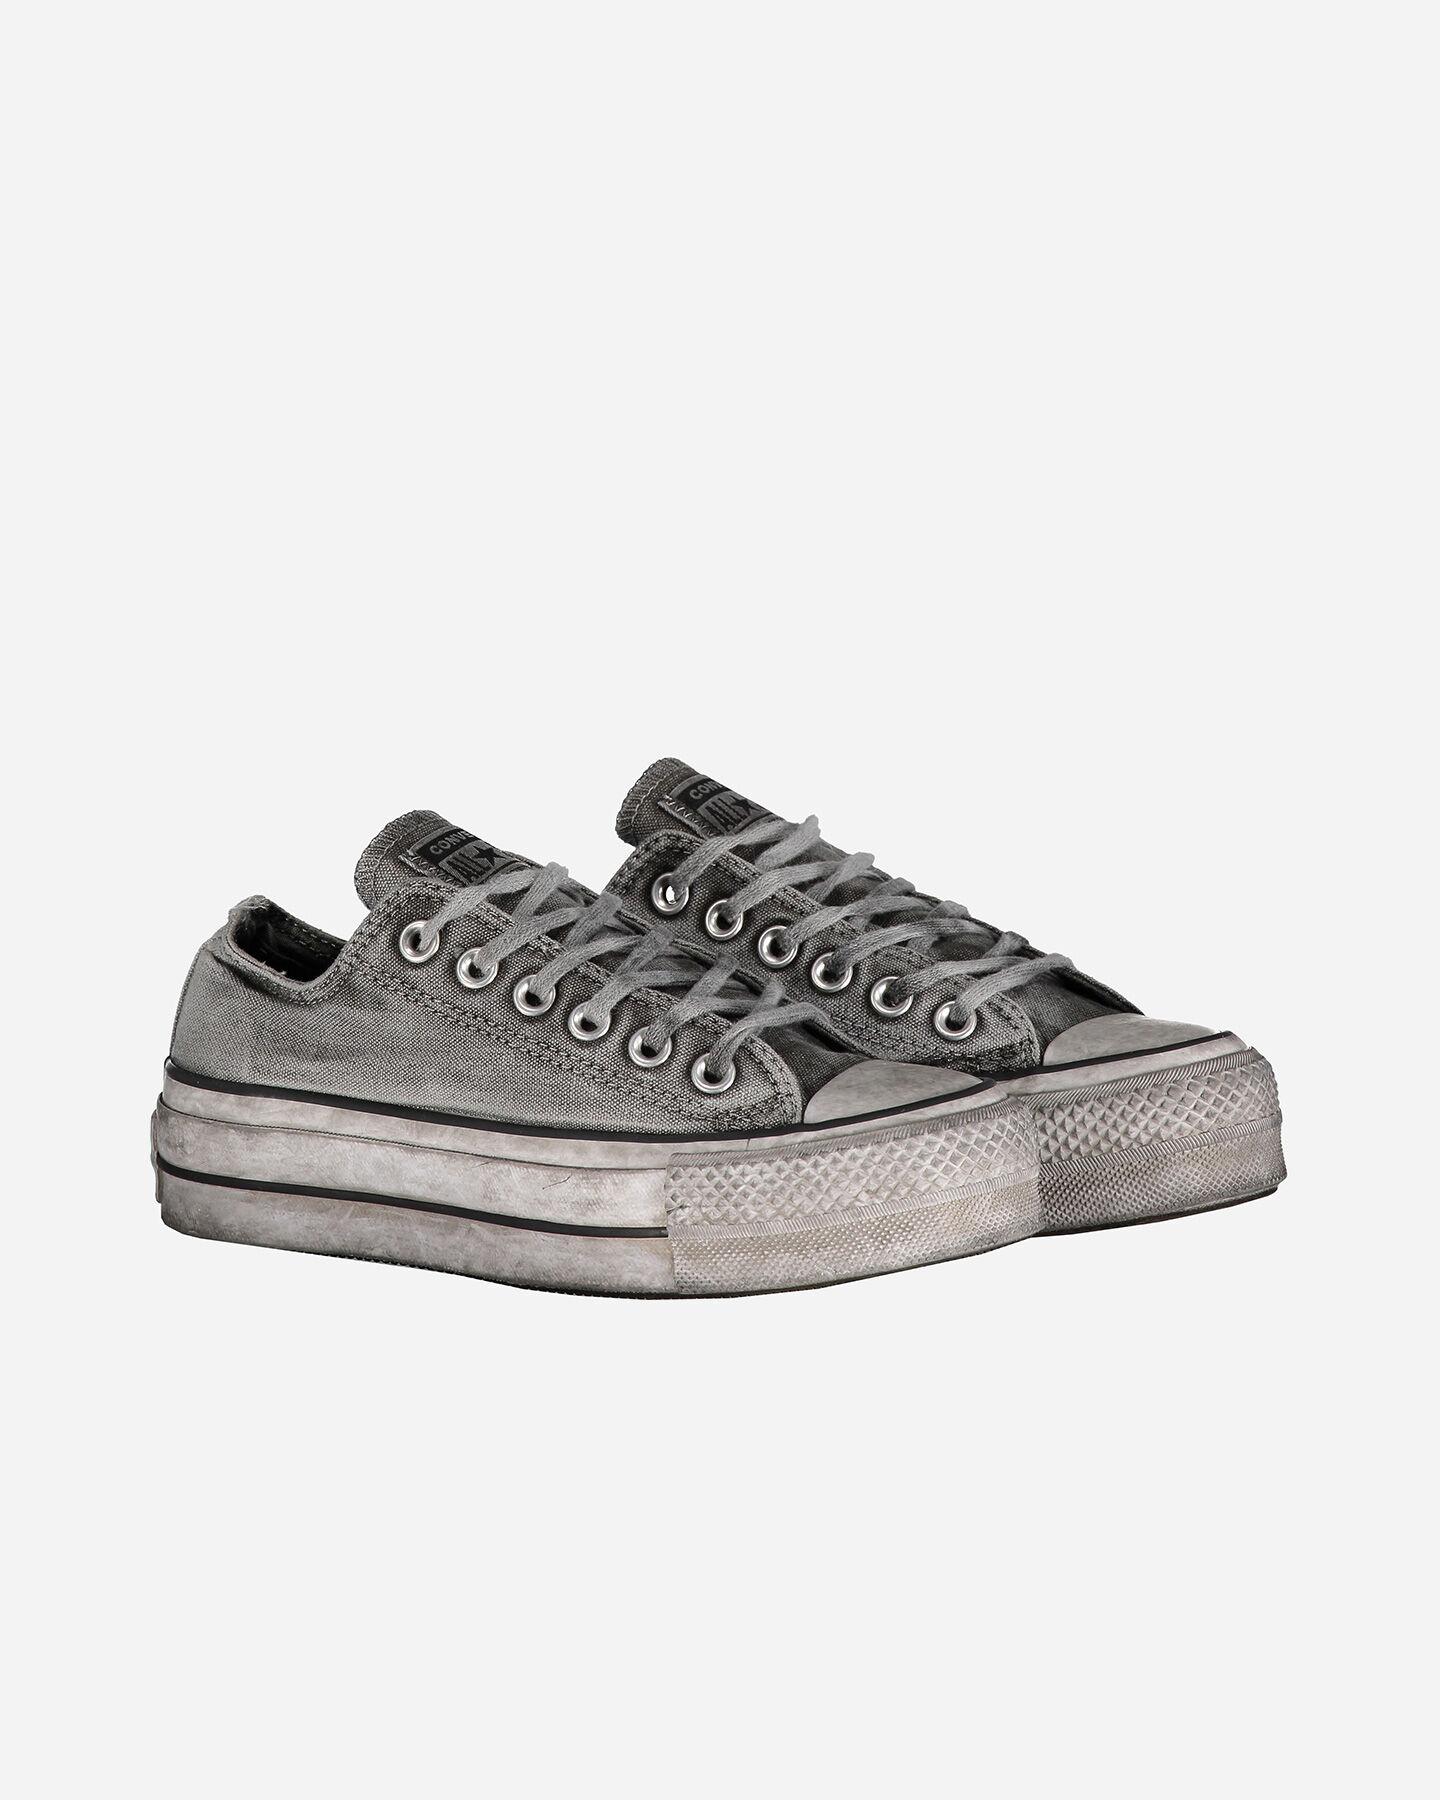 Scarpe sneakers CONVERSE CHUCK TAYLOR ALL STAR OX LIFT W S4062602 scatto 1